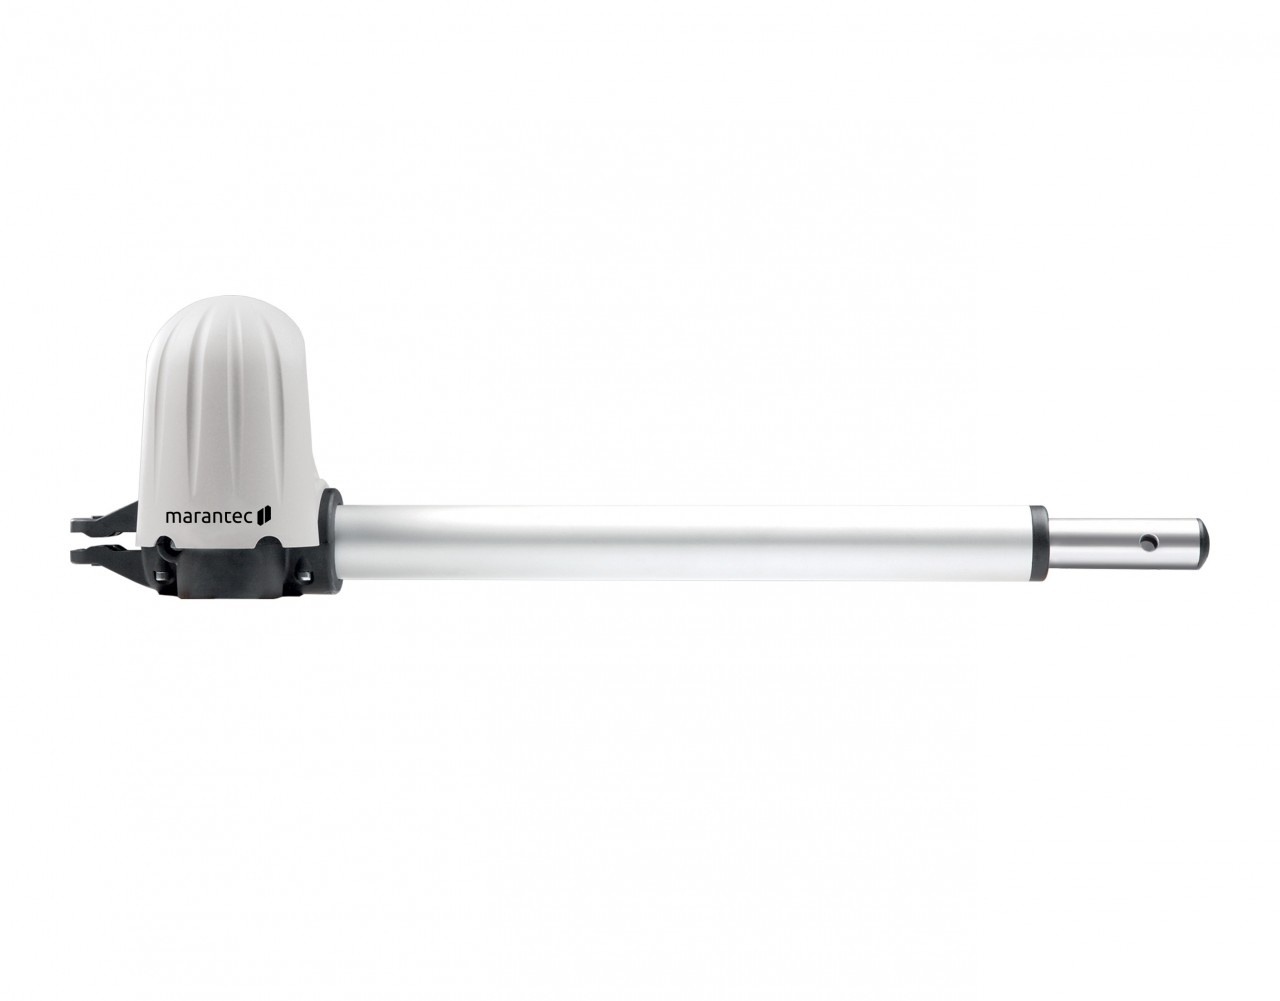 Marantec Comfort ST300 Kit Drehtorantrieb 2-flügelig bi-linked